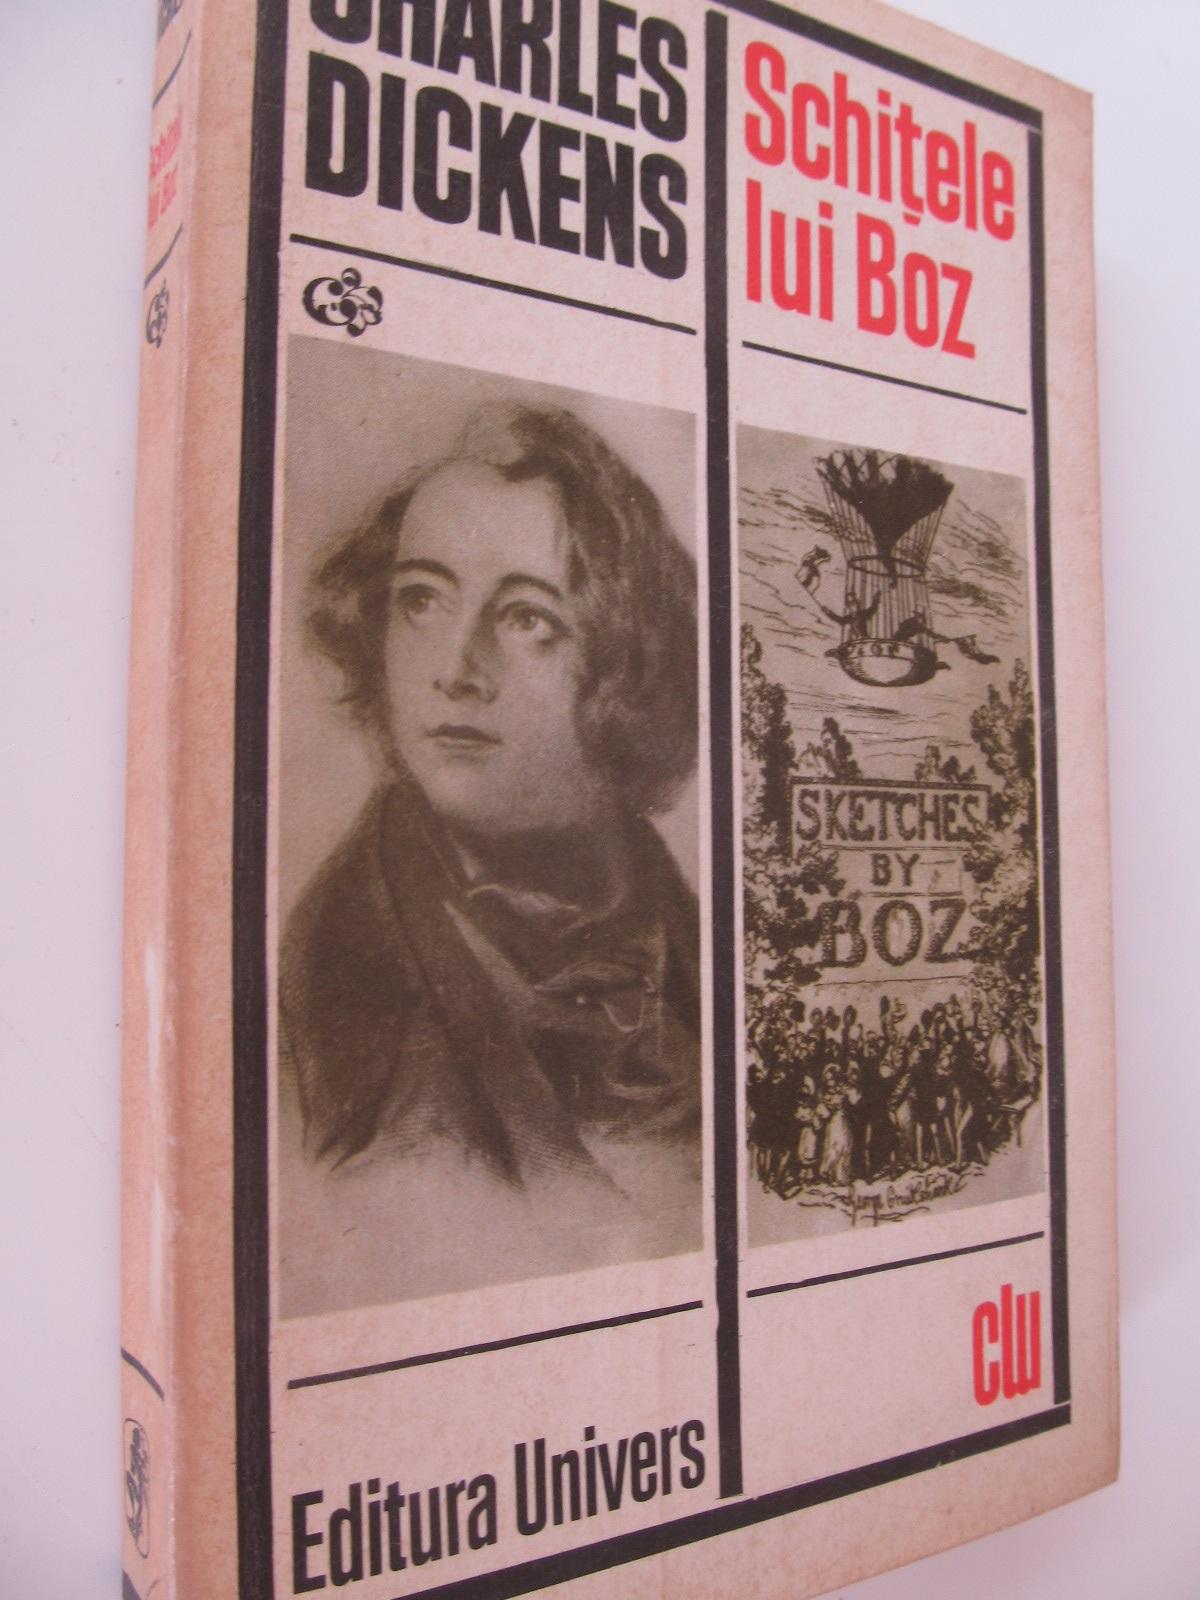 Schitele lui Boz - Charles Dickens | Detalii carte